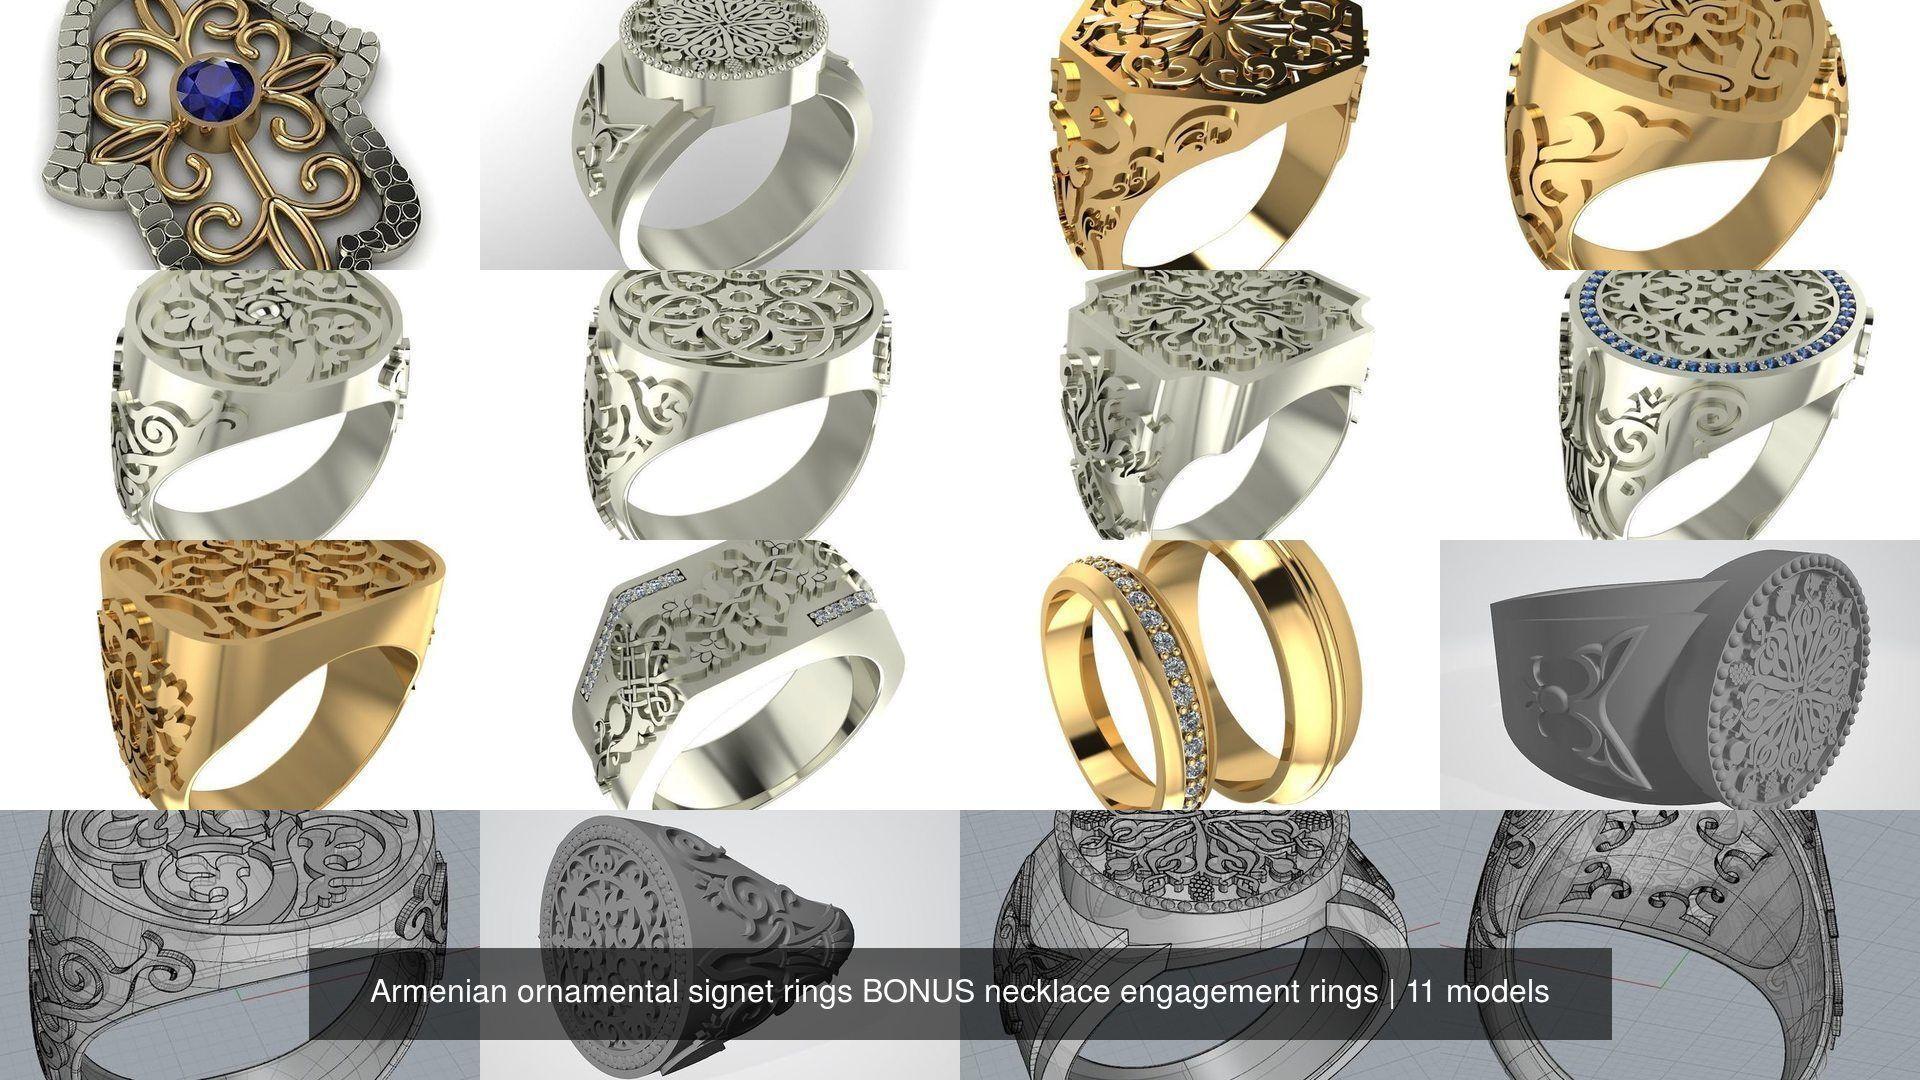 Armenian ornamental signet rings BONUS necklace engagement rings